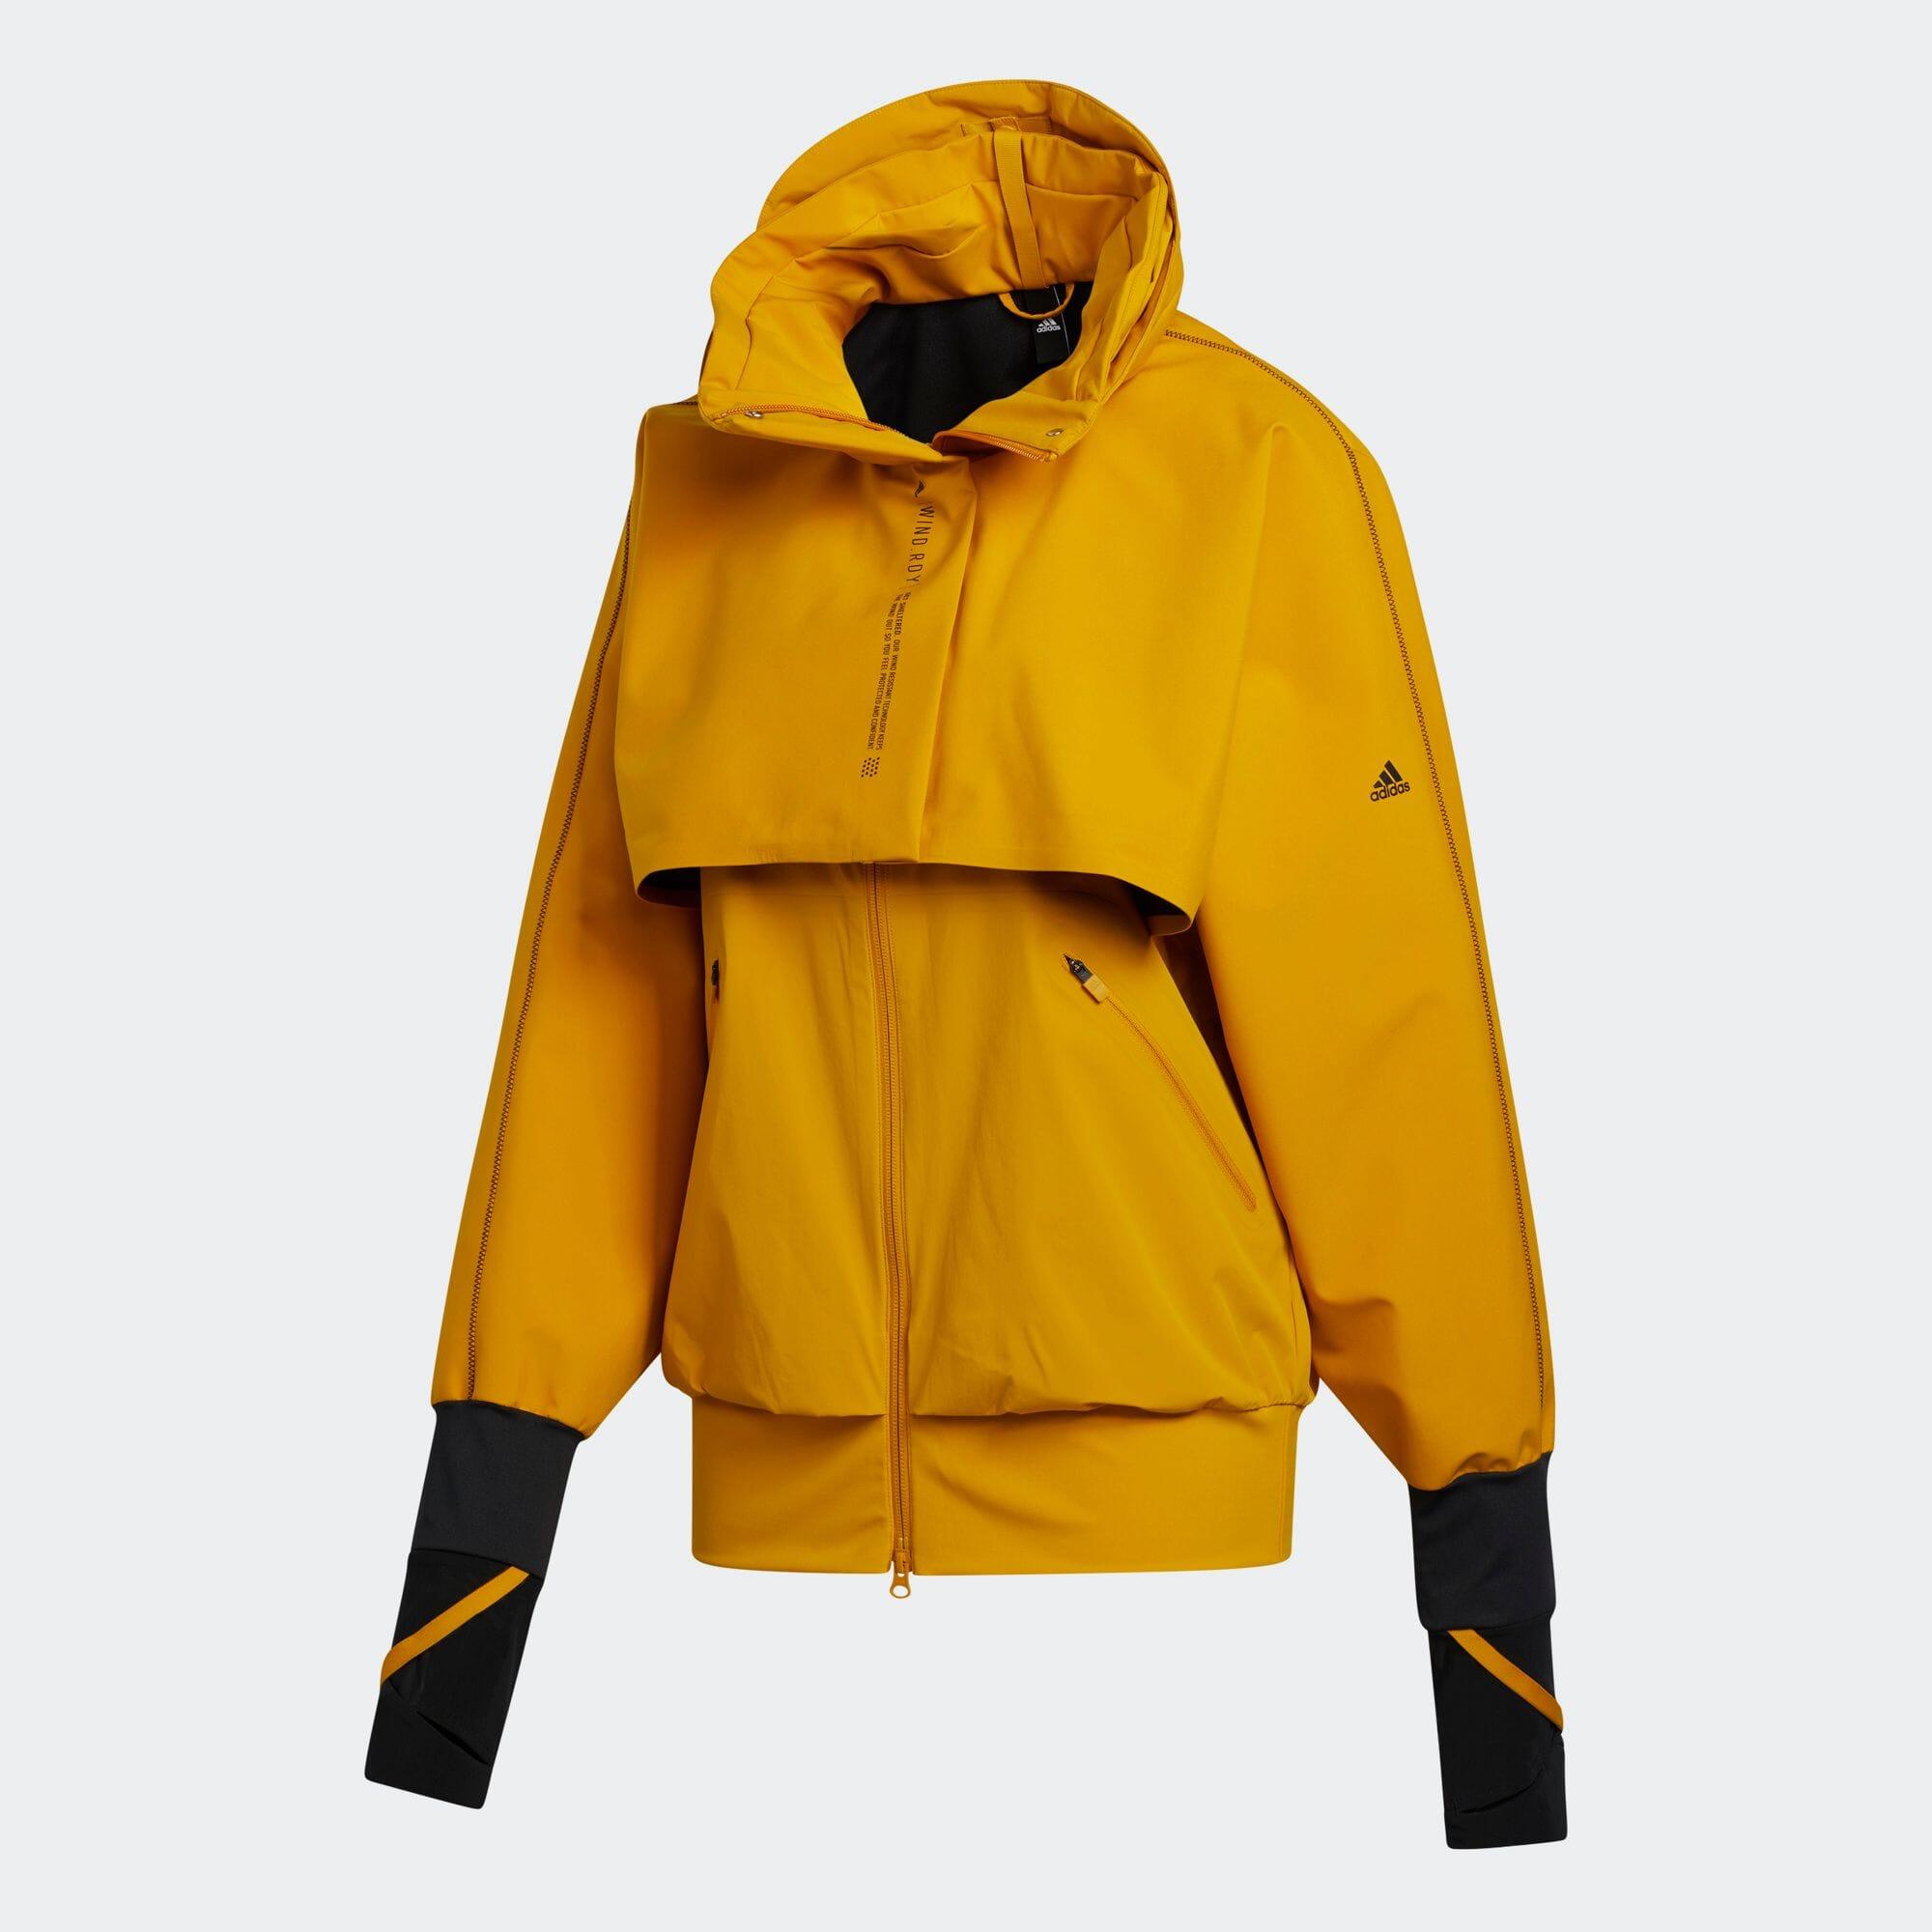 2-in-1 WIND. RDY プライムジャケット / 2-in-1 WIND. RDY Prime Jacket